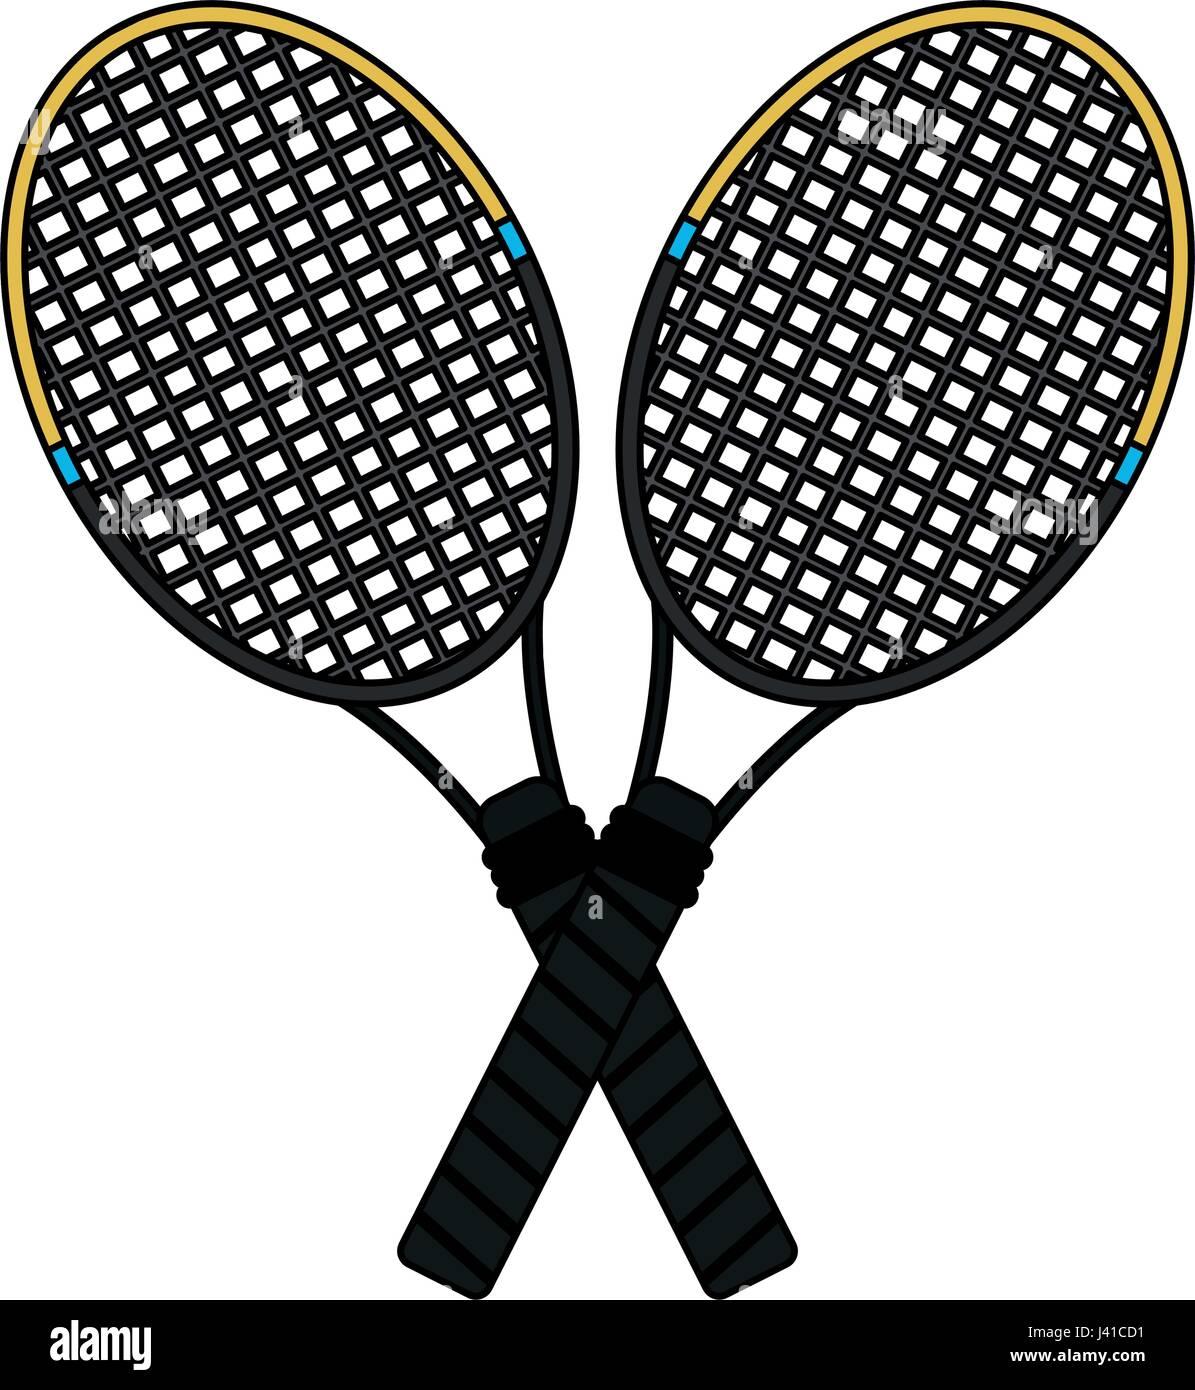 Colorful Image Cartoon Two Tennis Racquets Cross Stock Vector Image Art Alamy